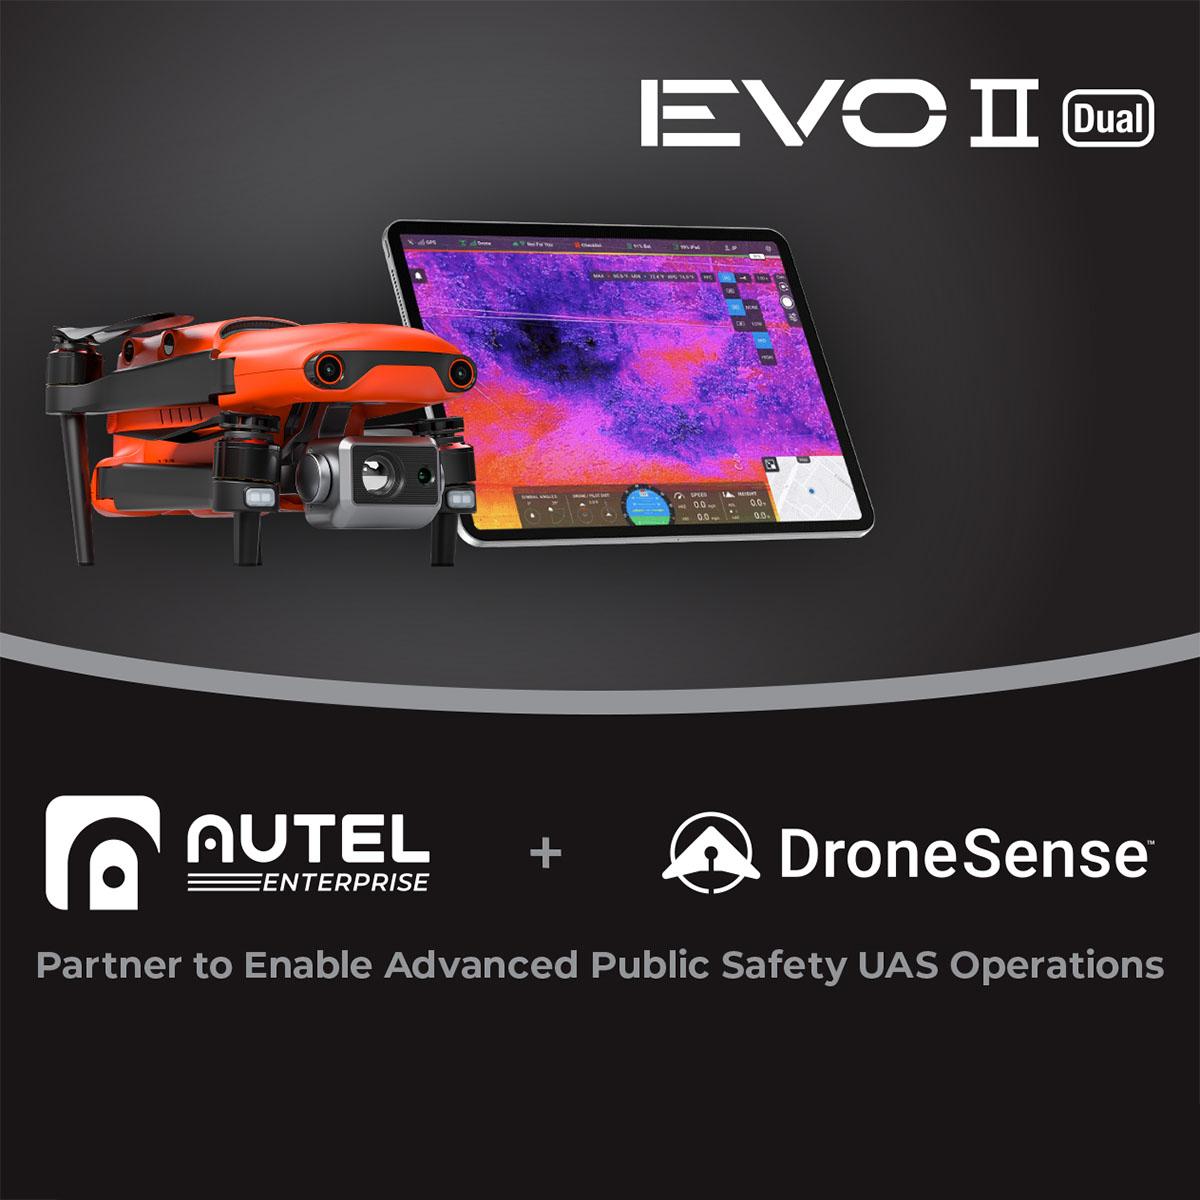 Autel Robotics and DroneSense Partner to Enable Advanced Public Safety UAS Operations